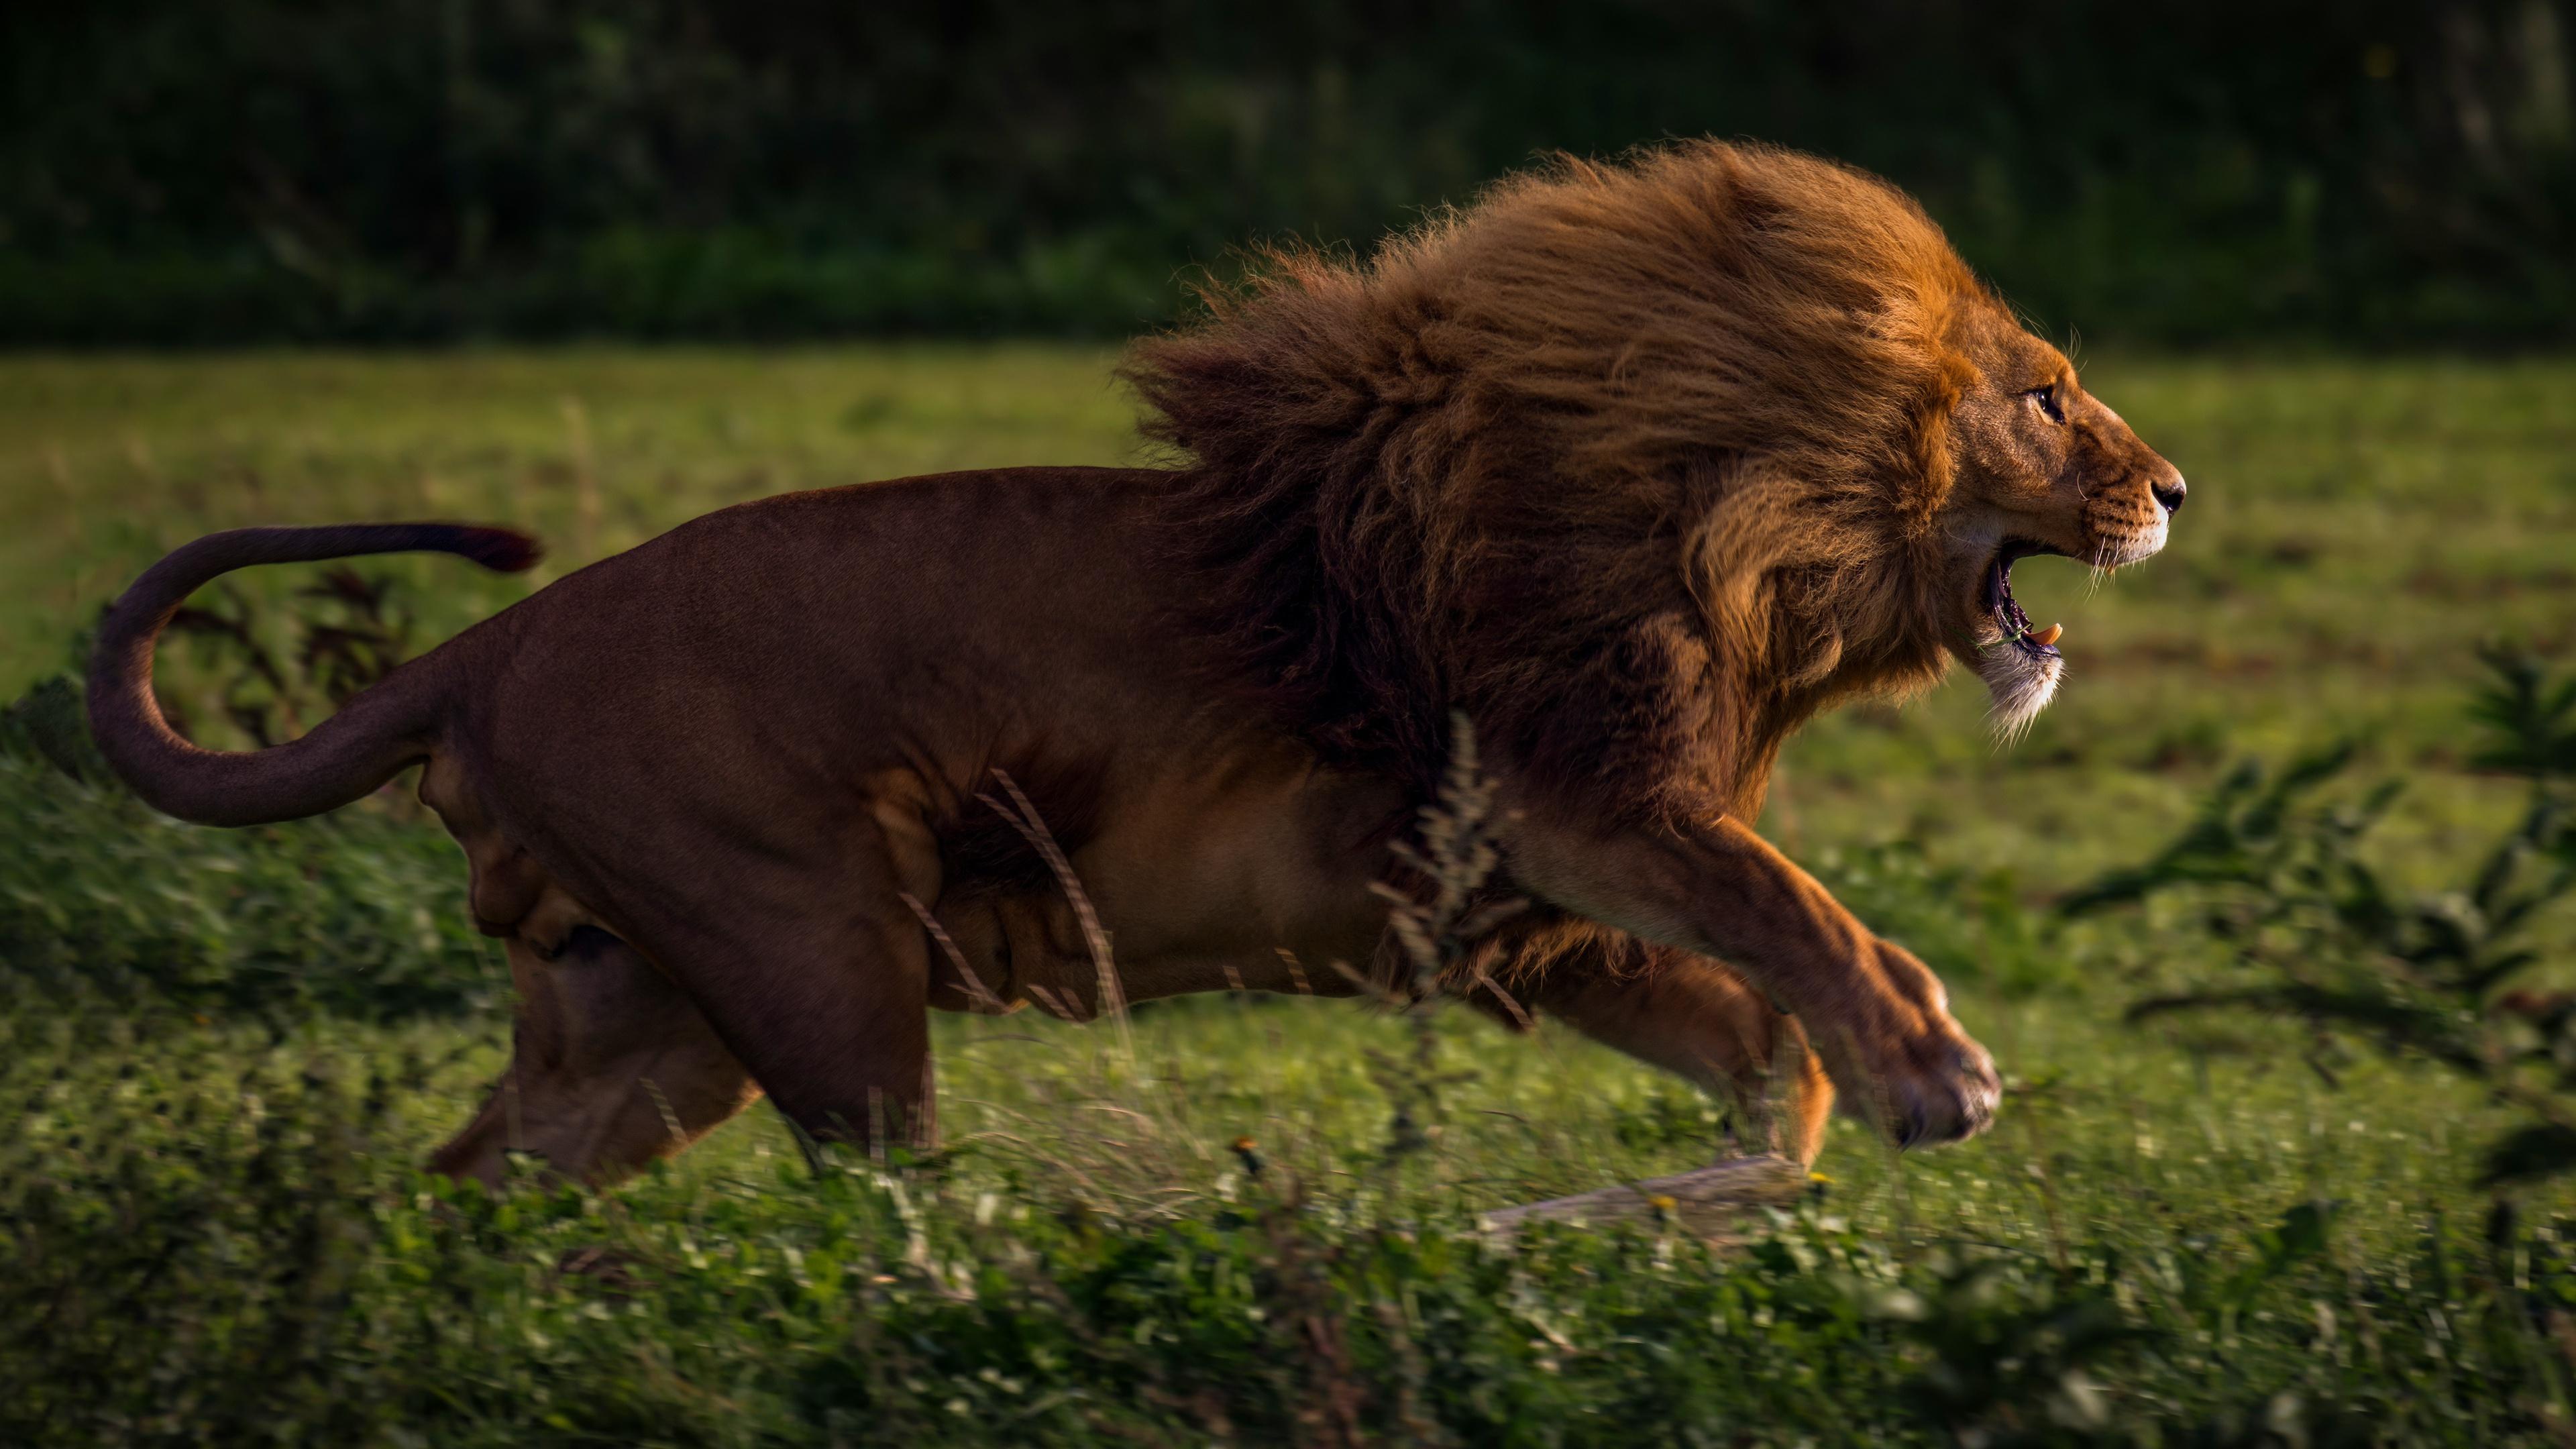 running lion 4k 1542239656 - Running Lion 4k - lion wallpapers, hd-wallpapers, animals wallpapers, 4k-wallpapers